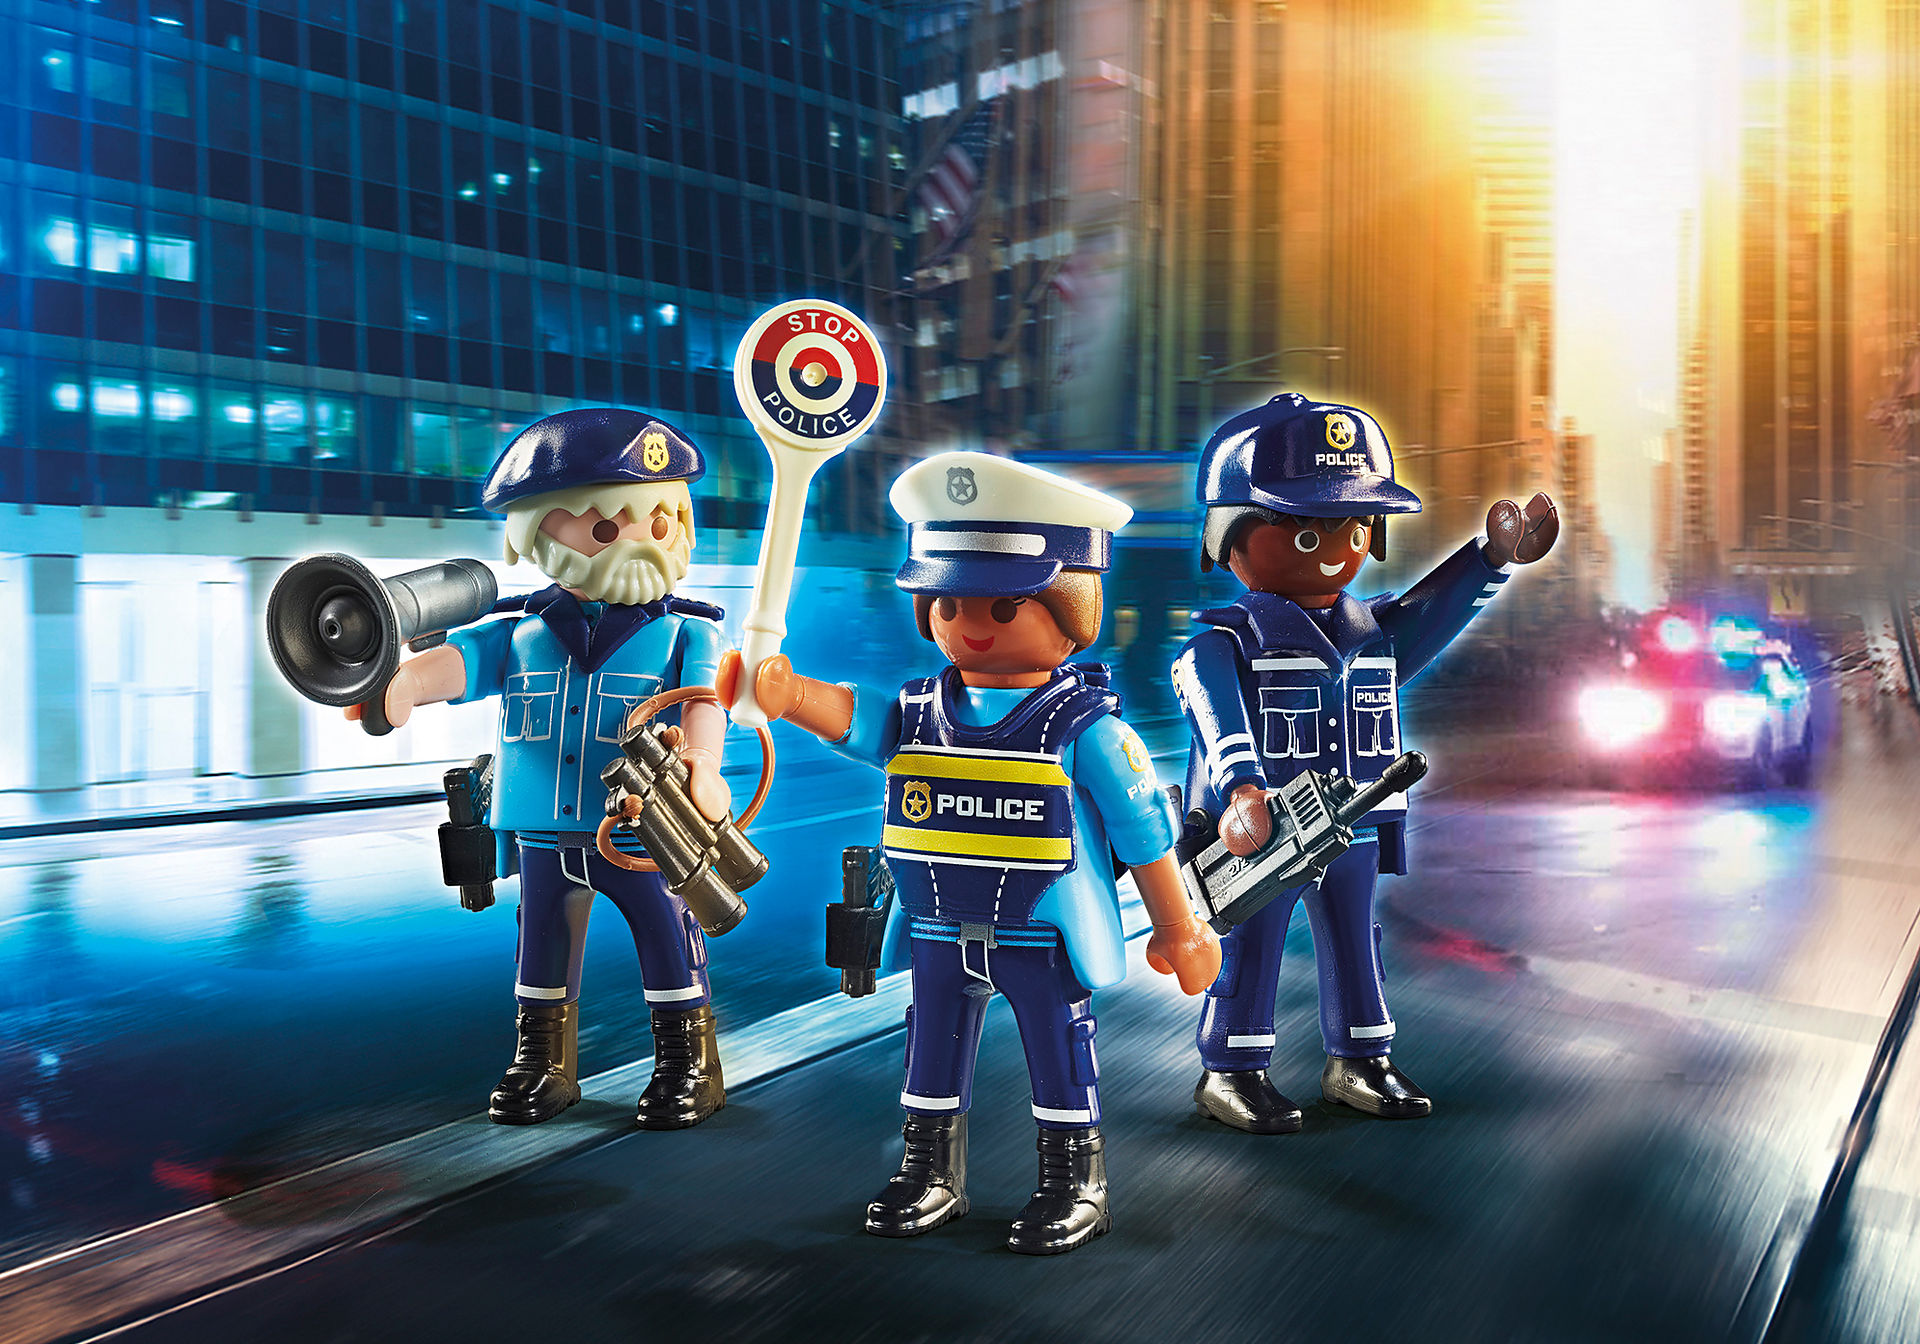 70669 Police Figure Set zoom image1